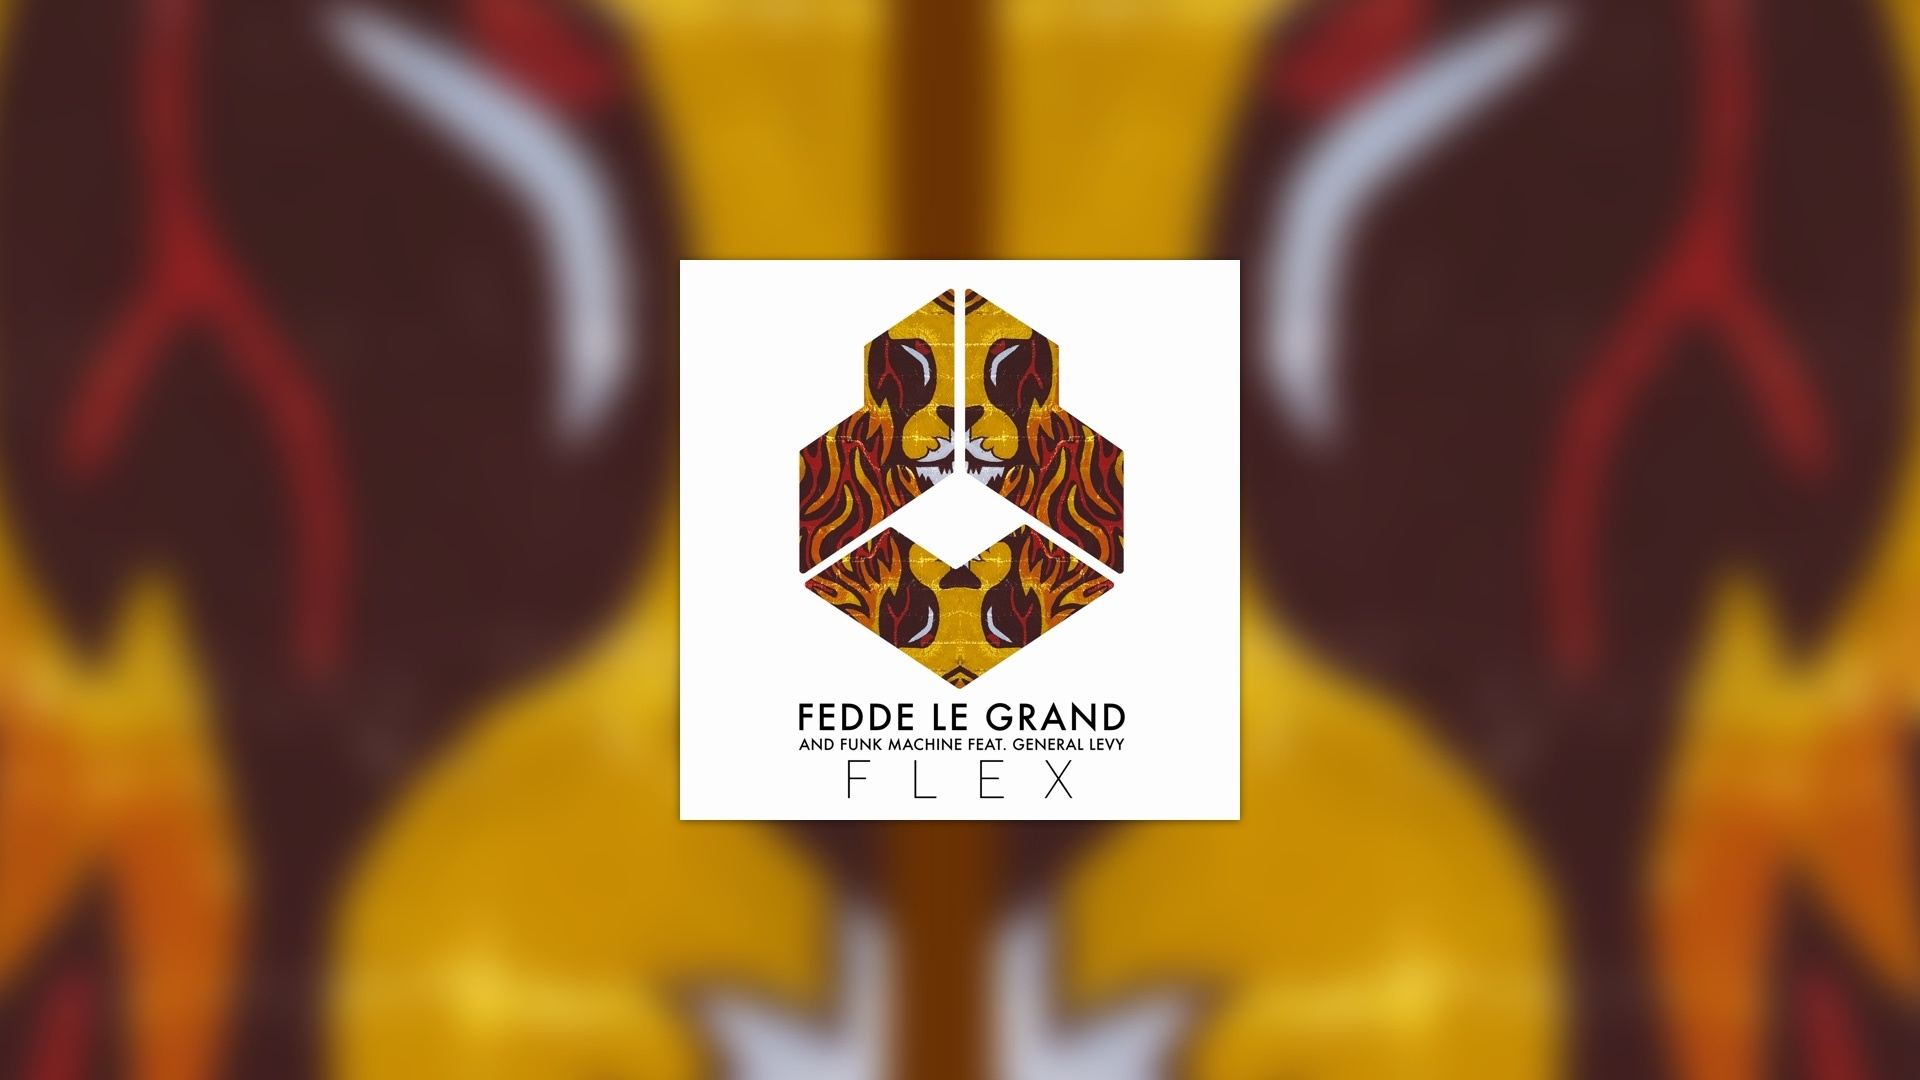 FEDDE LE GRAND AND FUNK MACHINE FEAT. GENERAL LEVY - FLEX